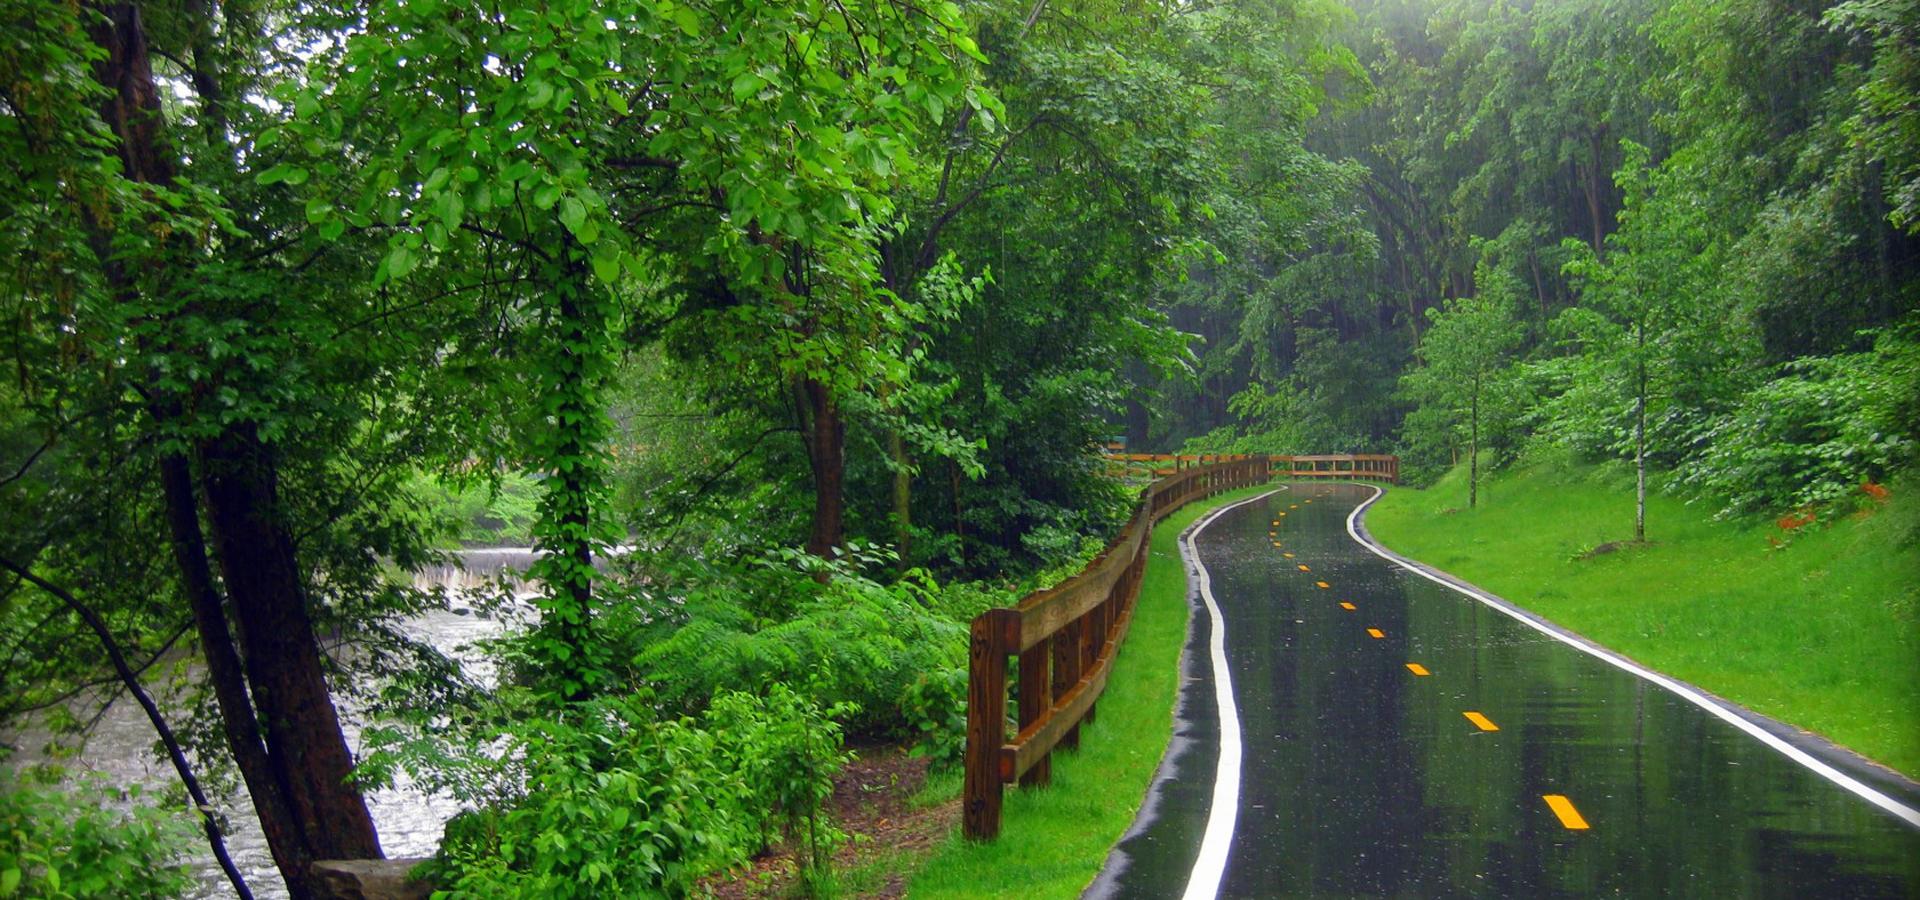 Rain Park Park Rain Forest Background Image For Free